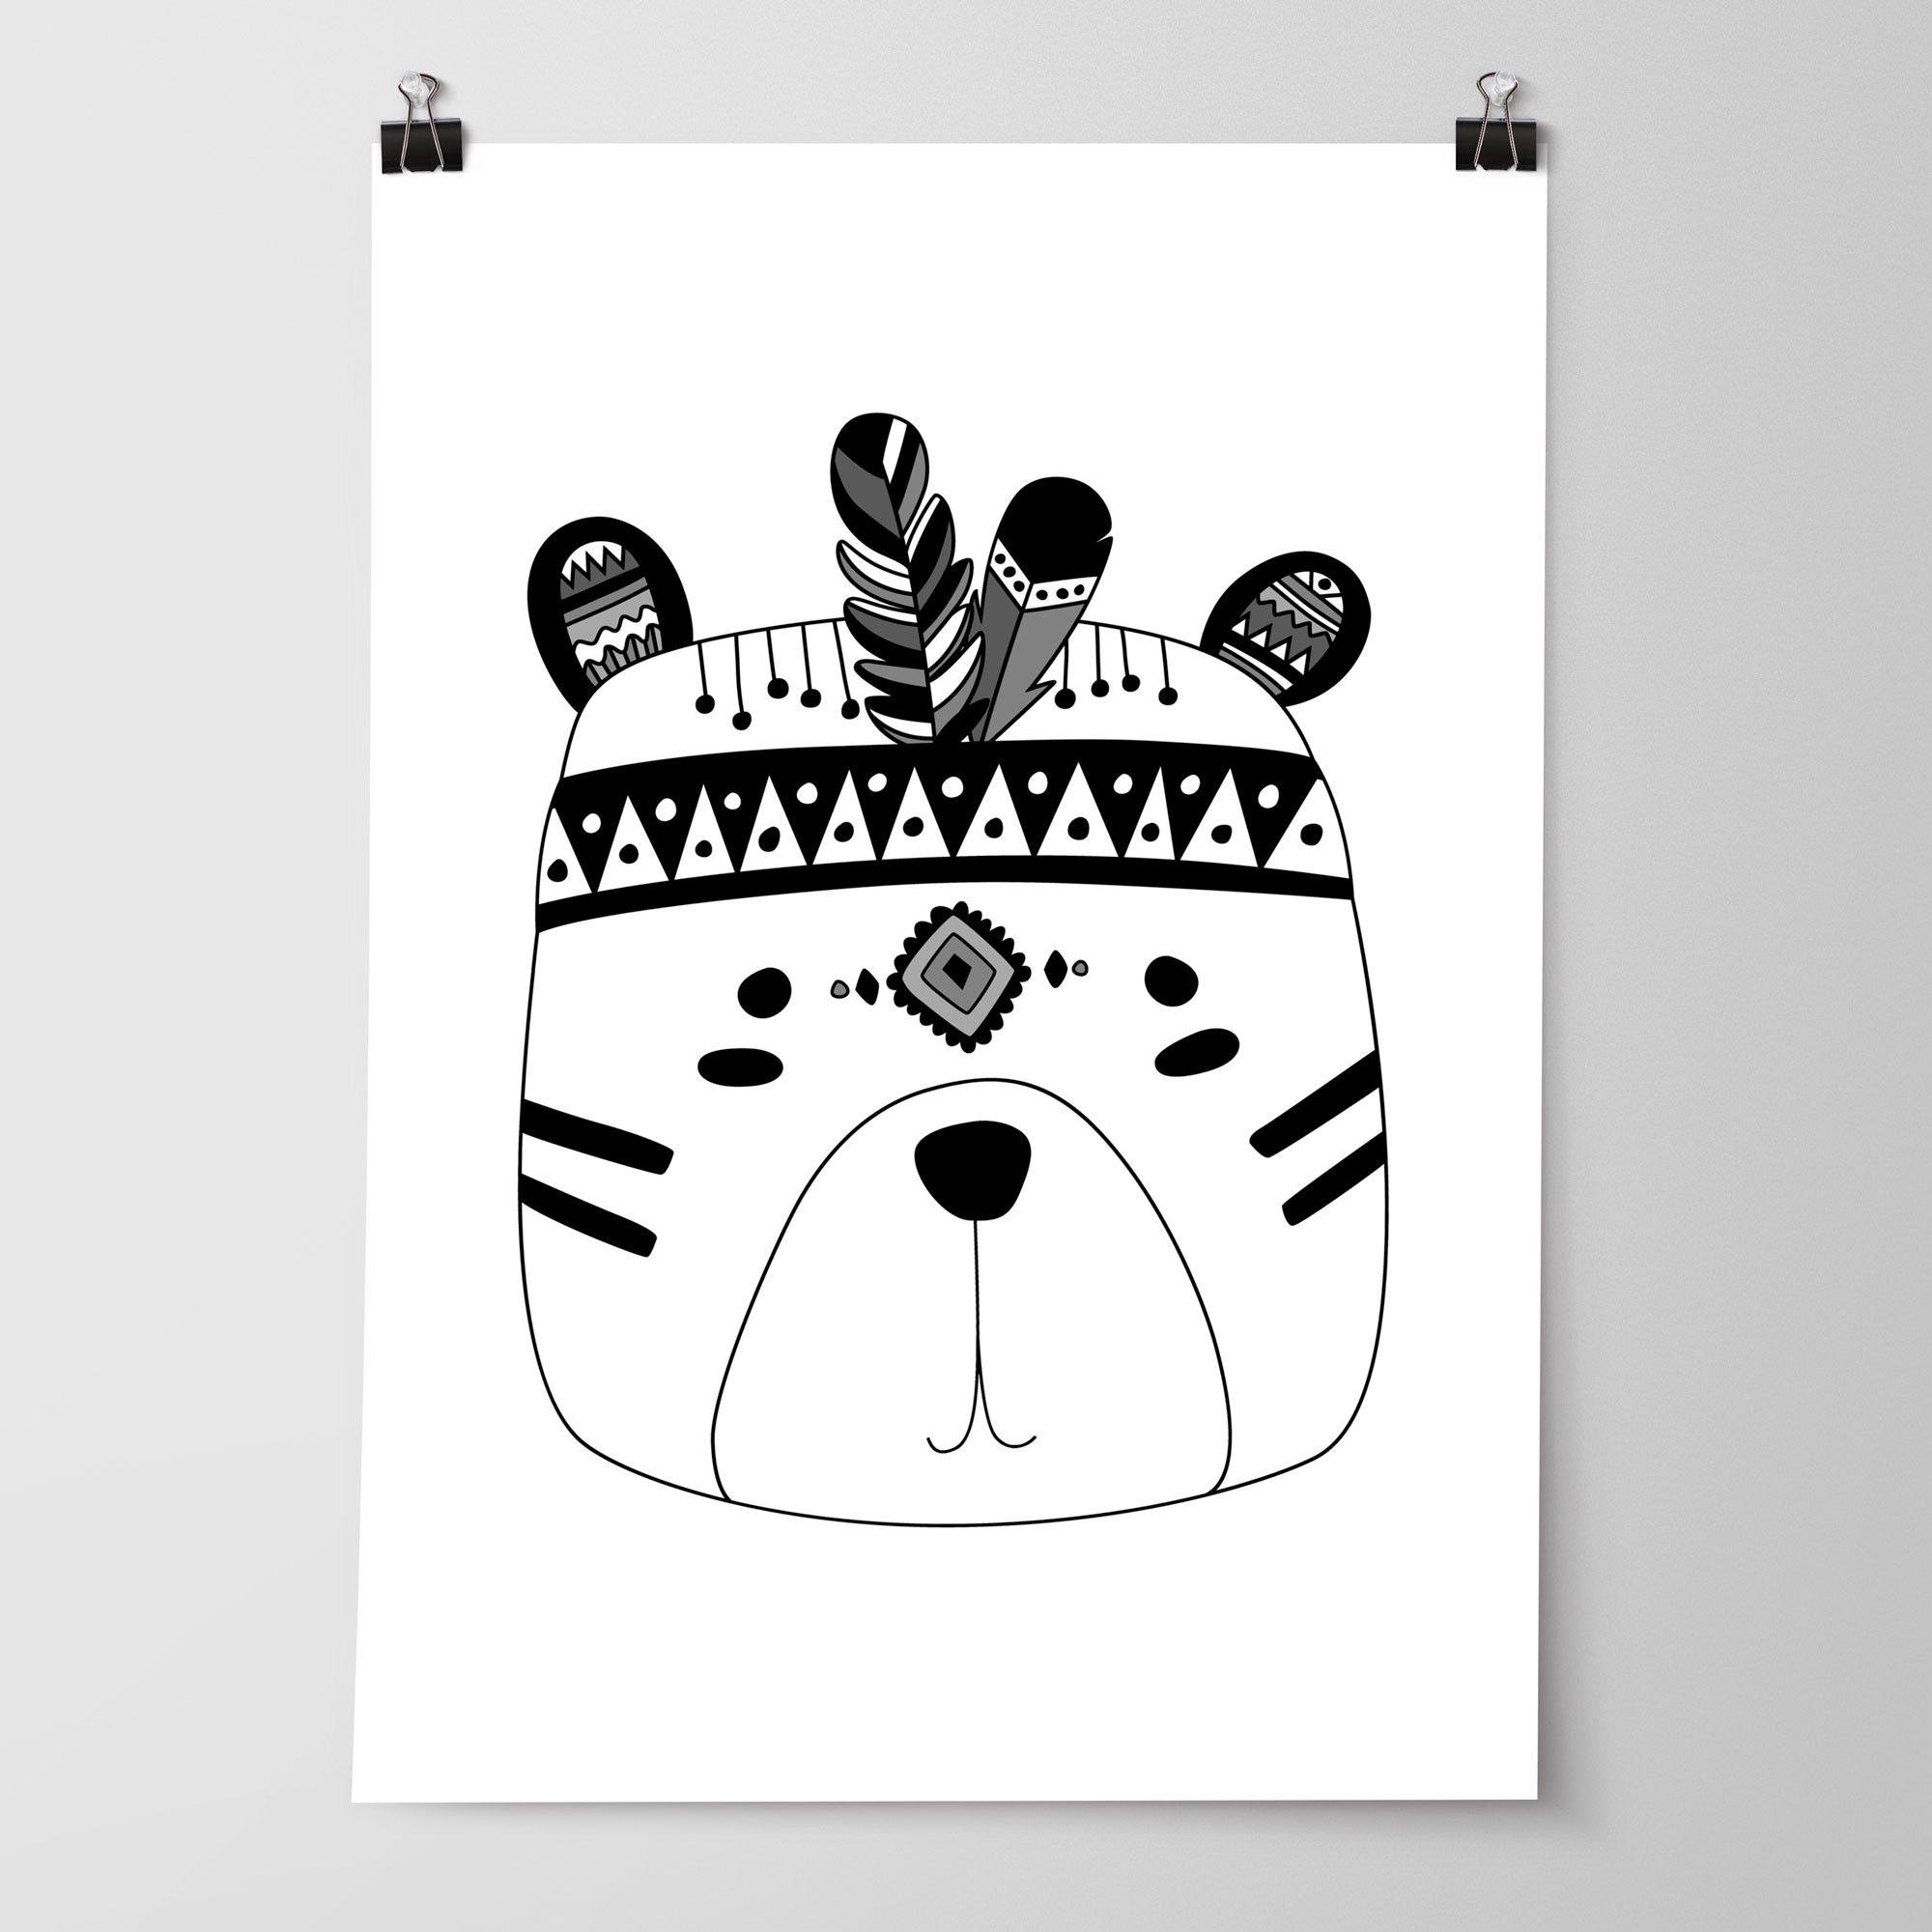 monochrome tribal animal prints set of 3 nursery bedroom wall art print set - Kids Animal Prints